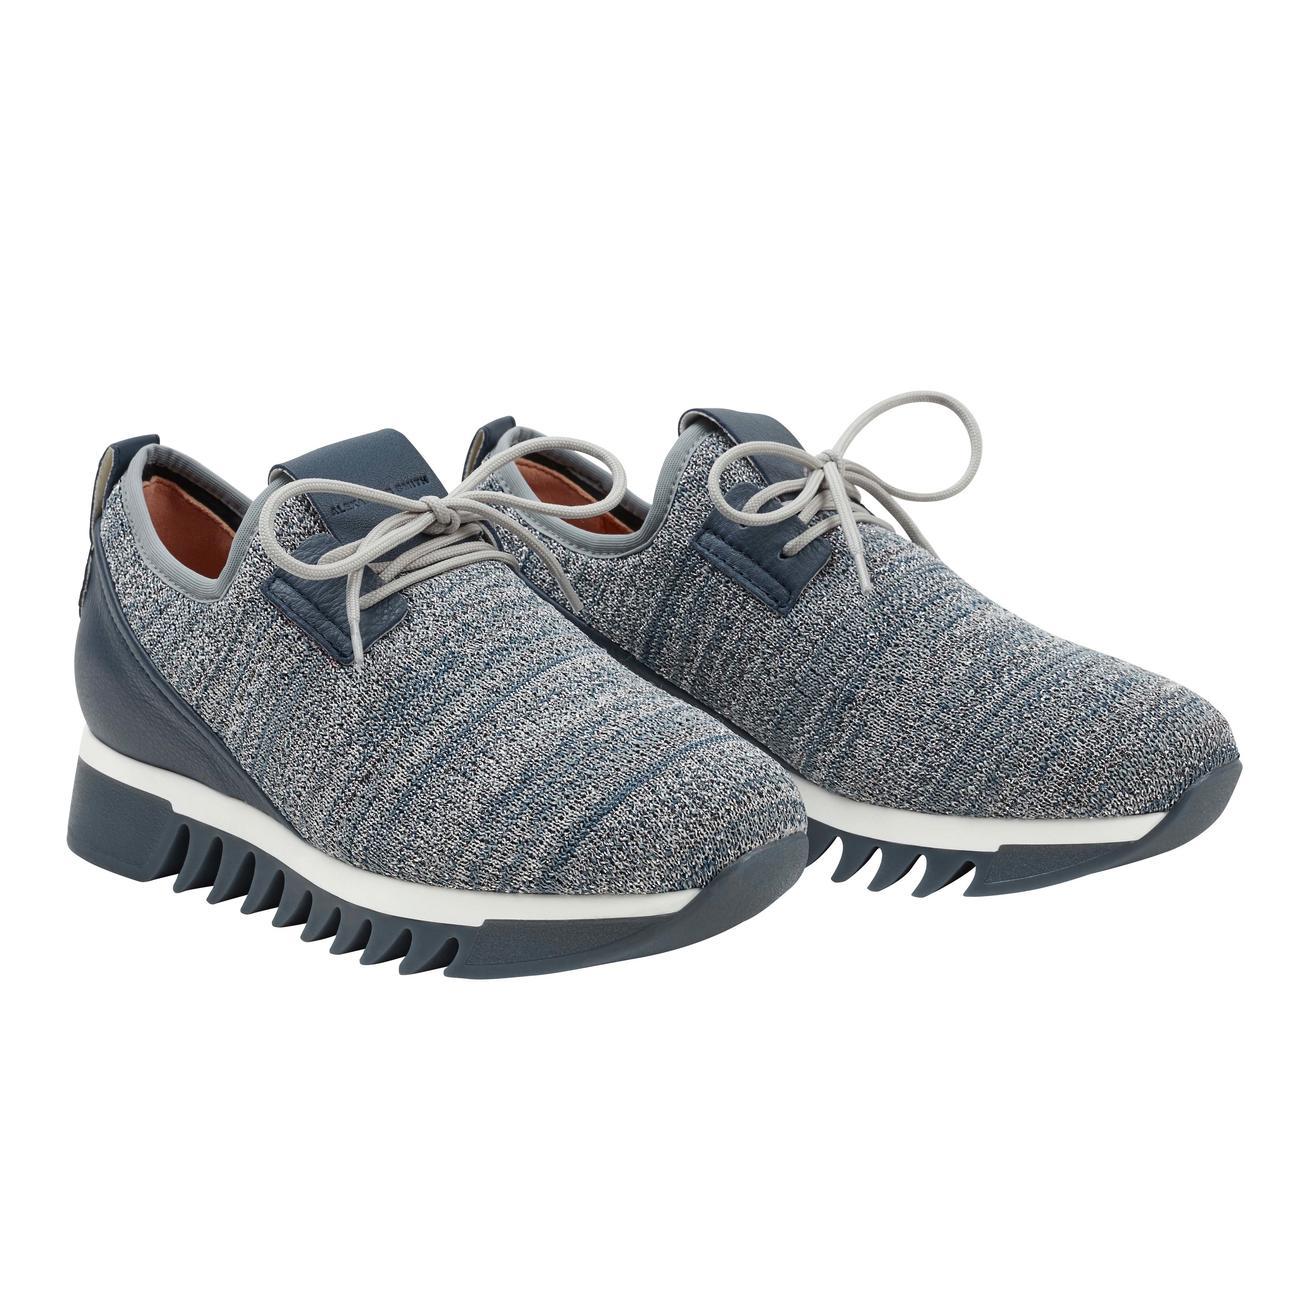 Alexander Smith knitted sneakers | Klassiker entdecken